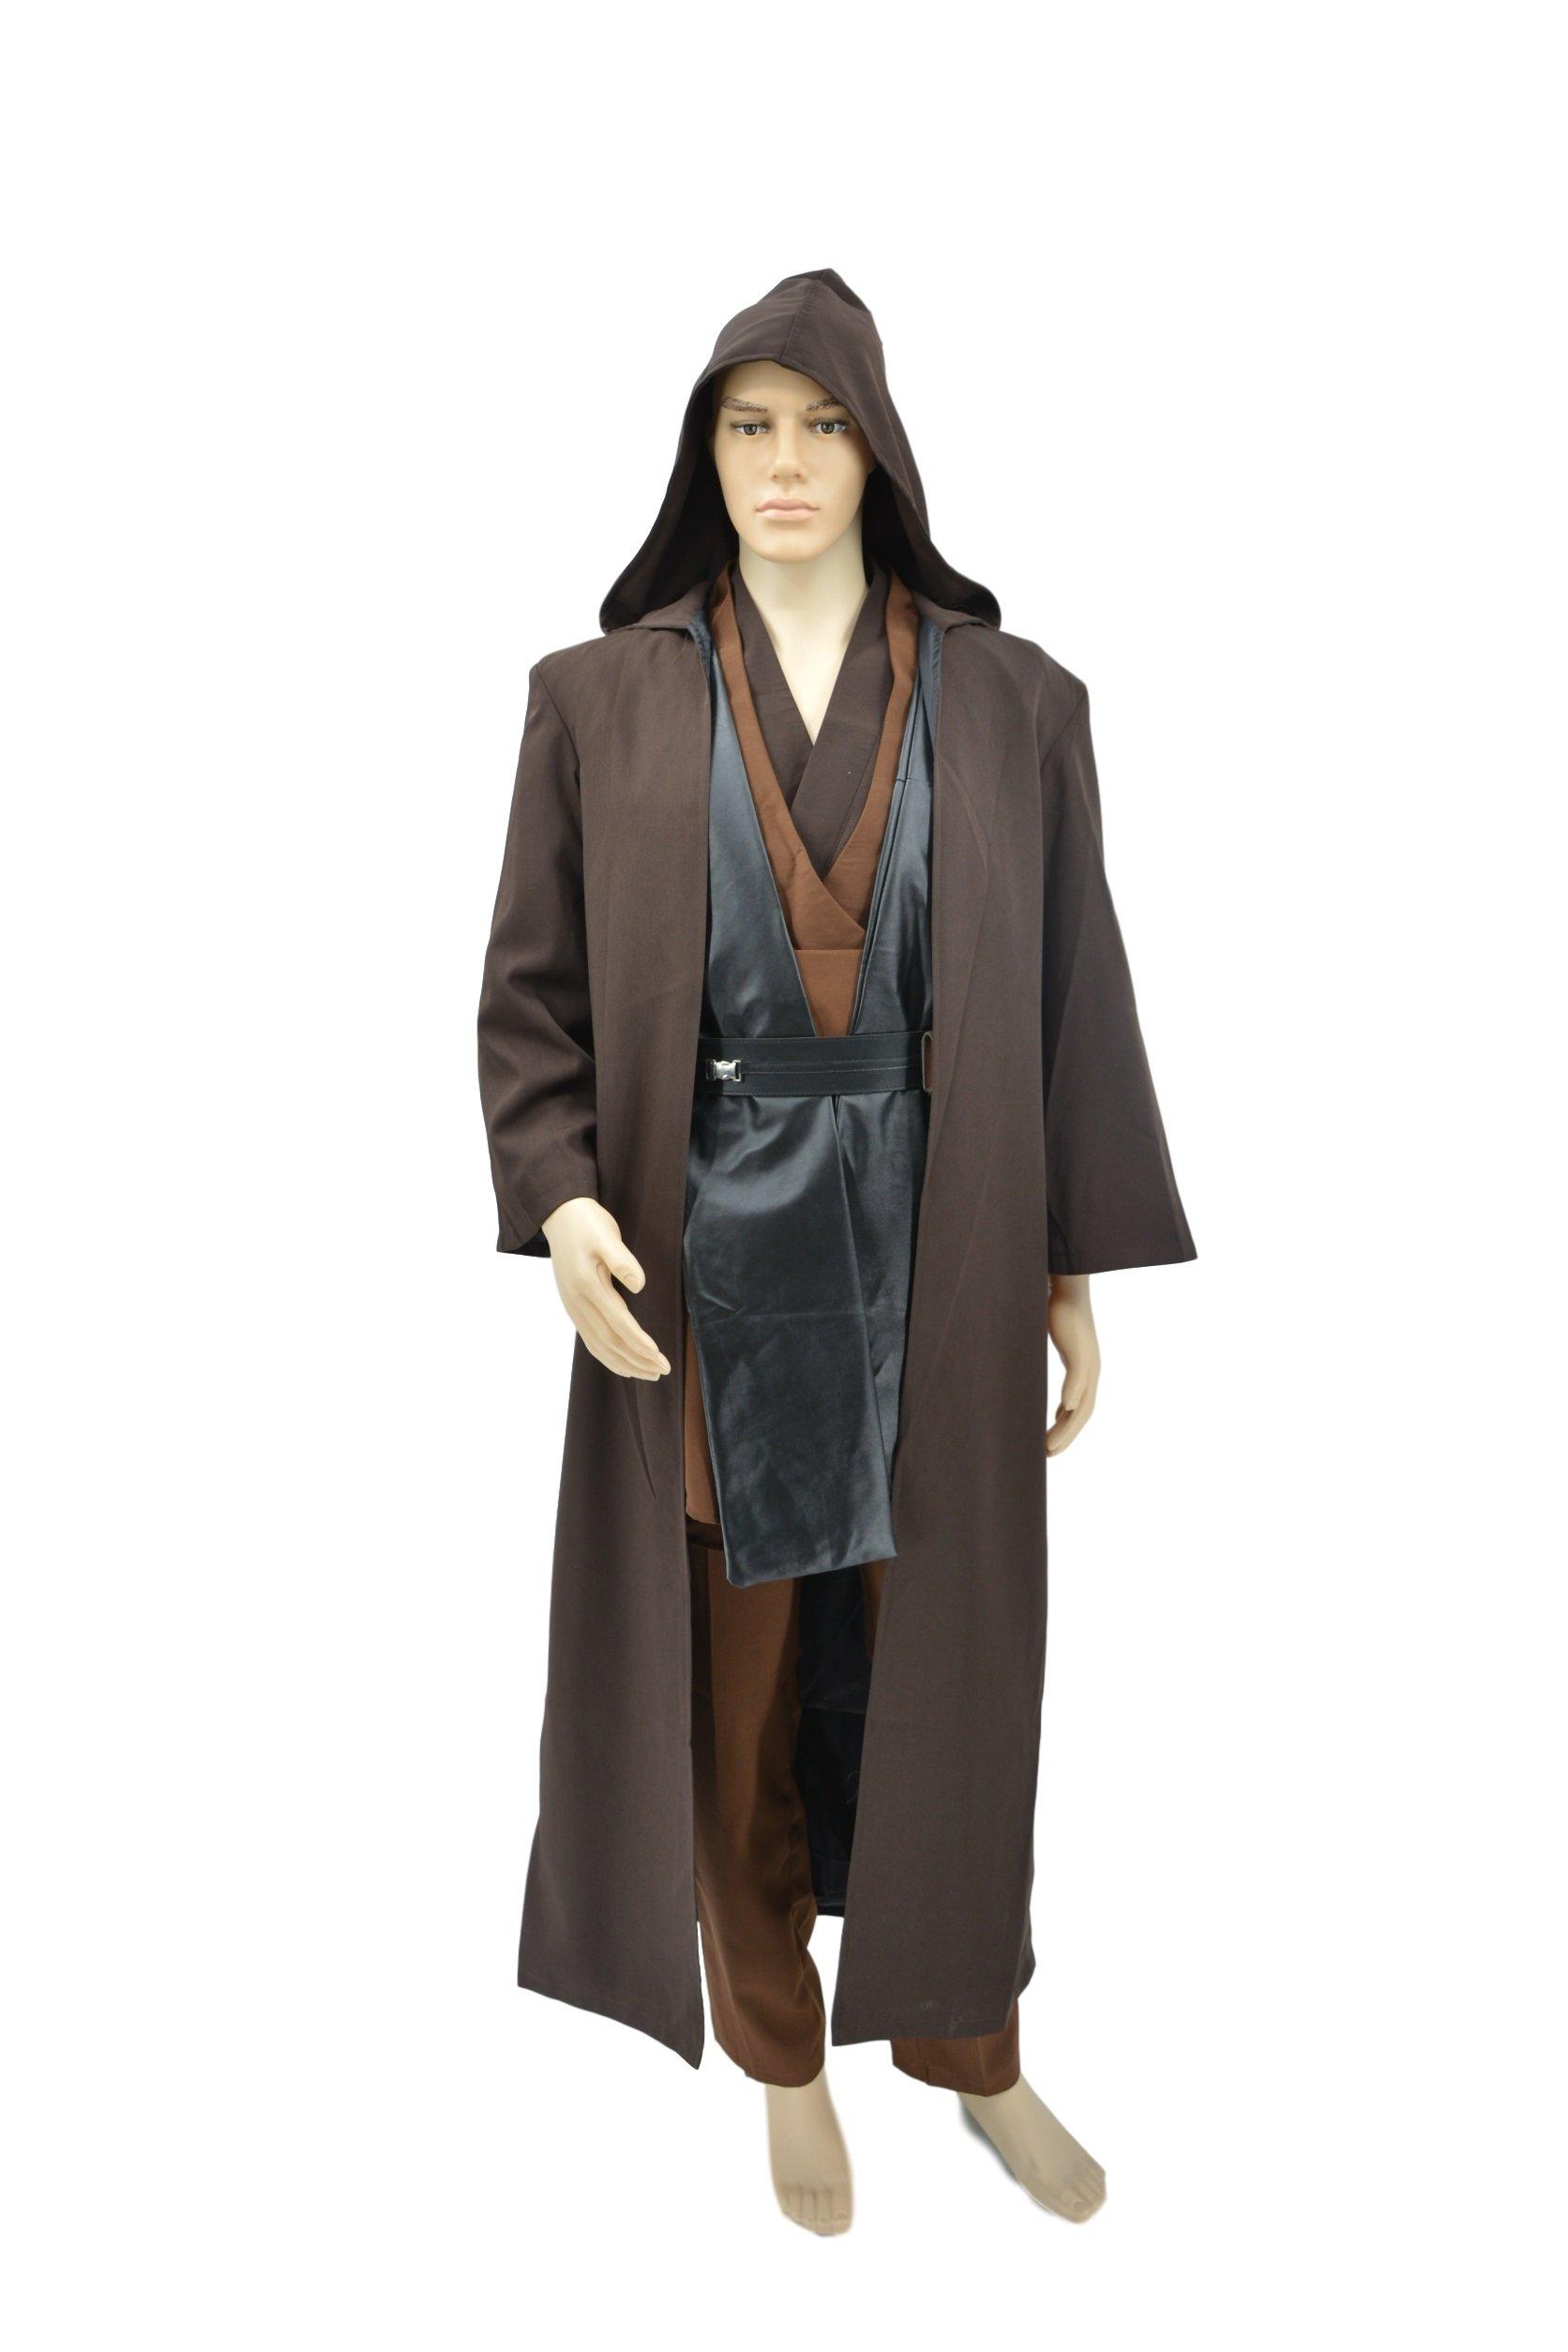 hideaway Star Wars Adult Deluxe Anakin Skywalker Costume [ Size : M, L, XL ] Cosplay (XL) by hideaway (Image #3)